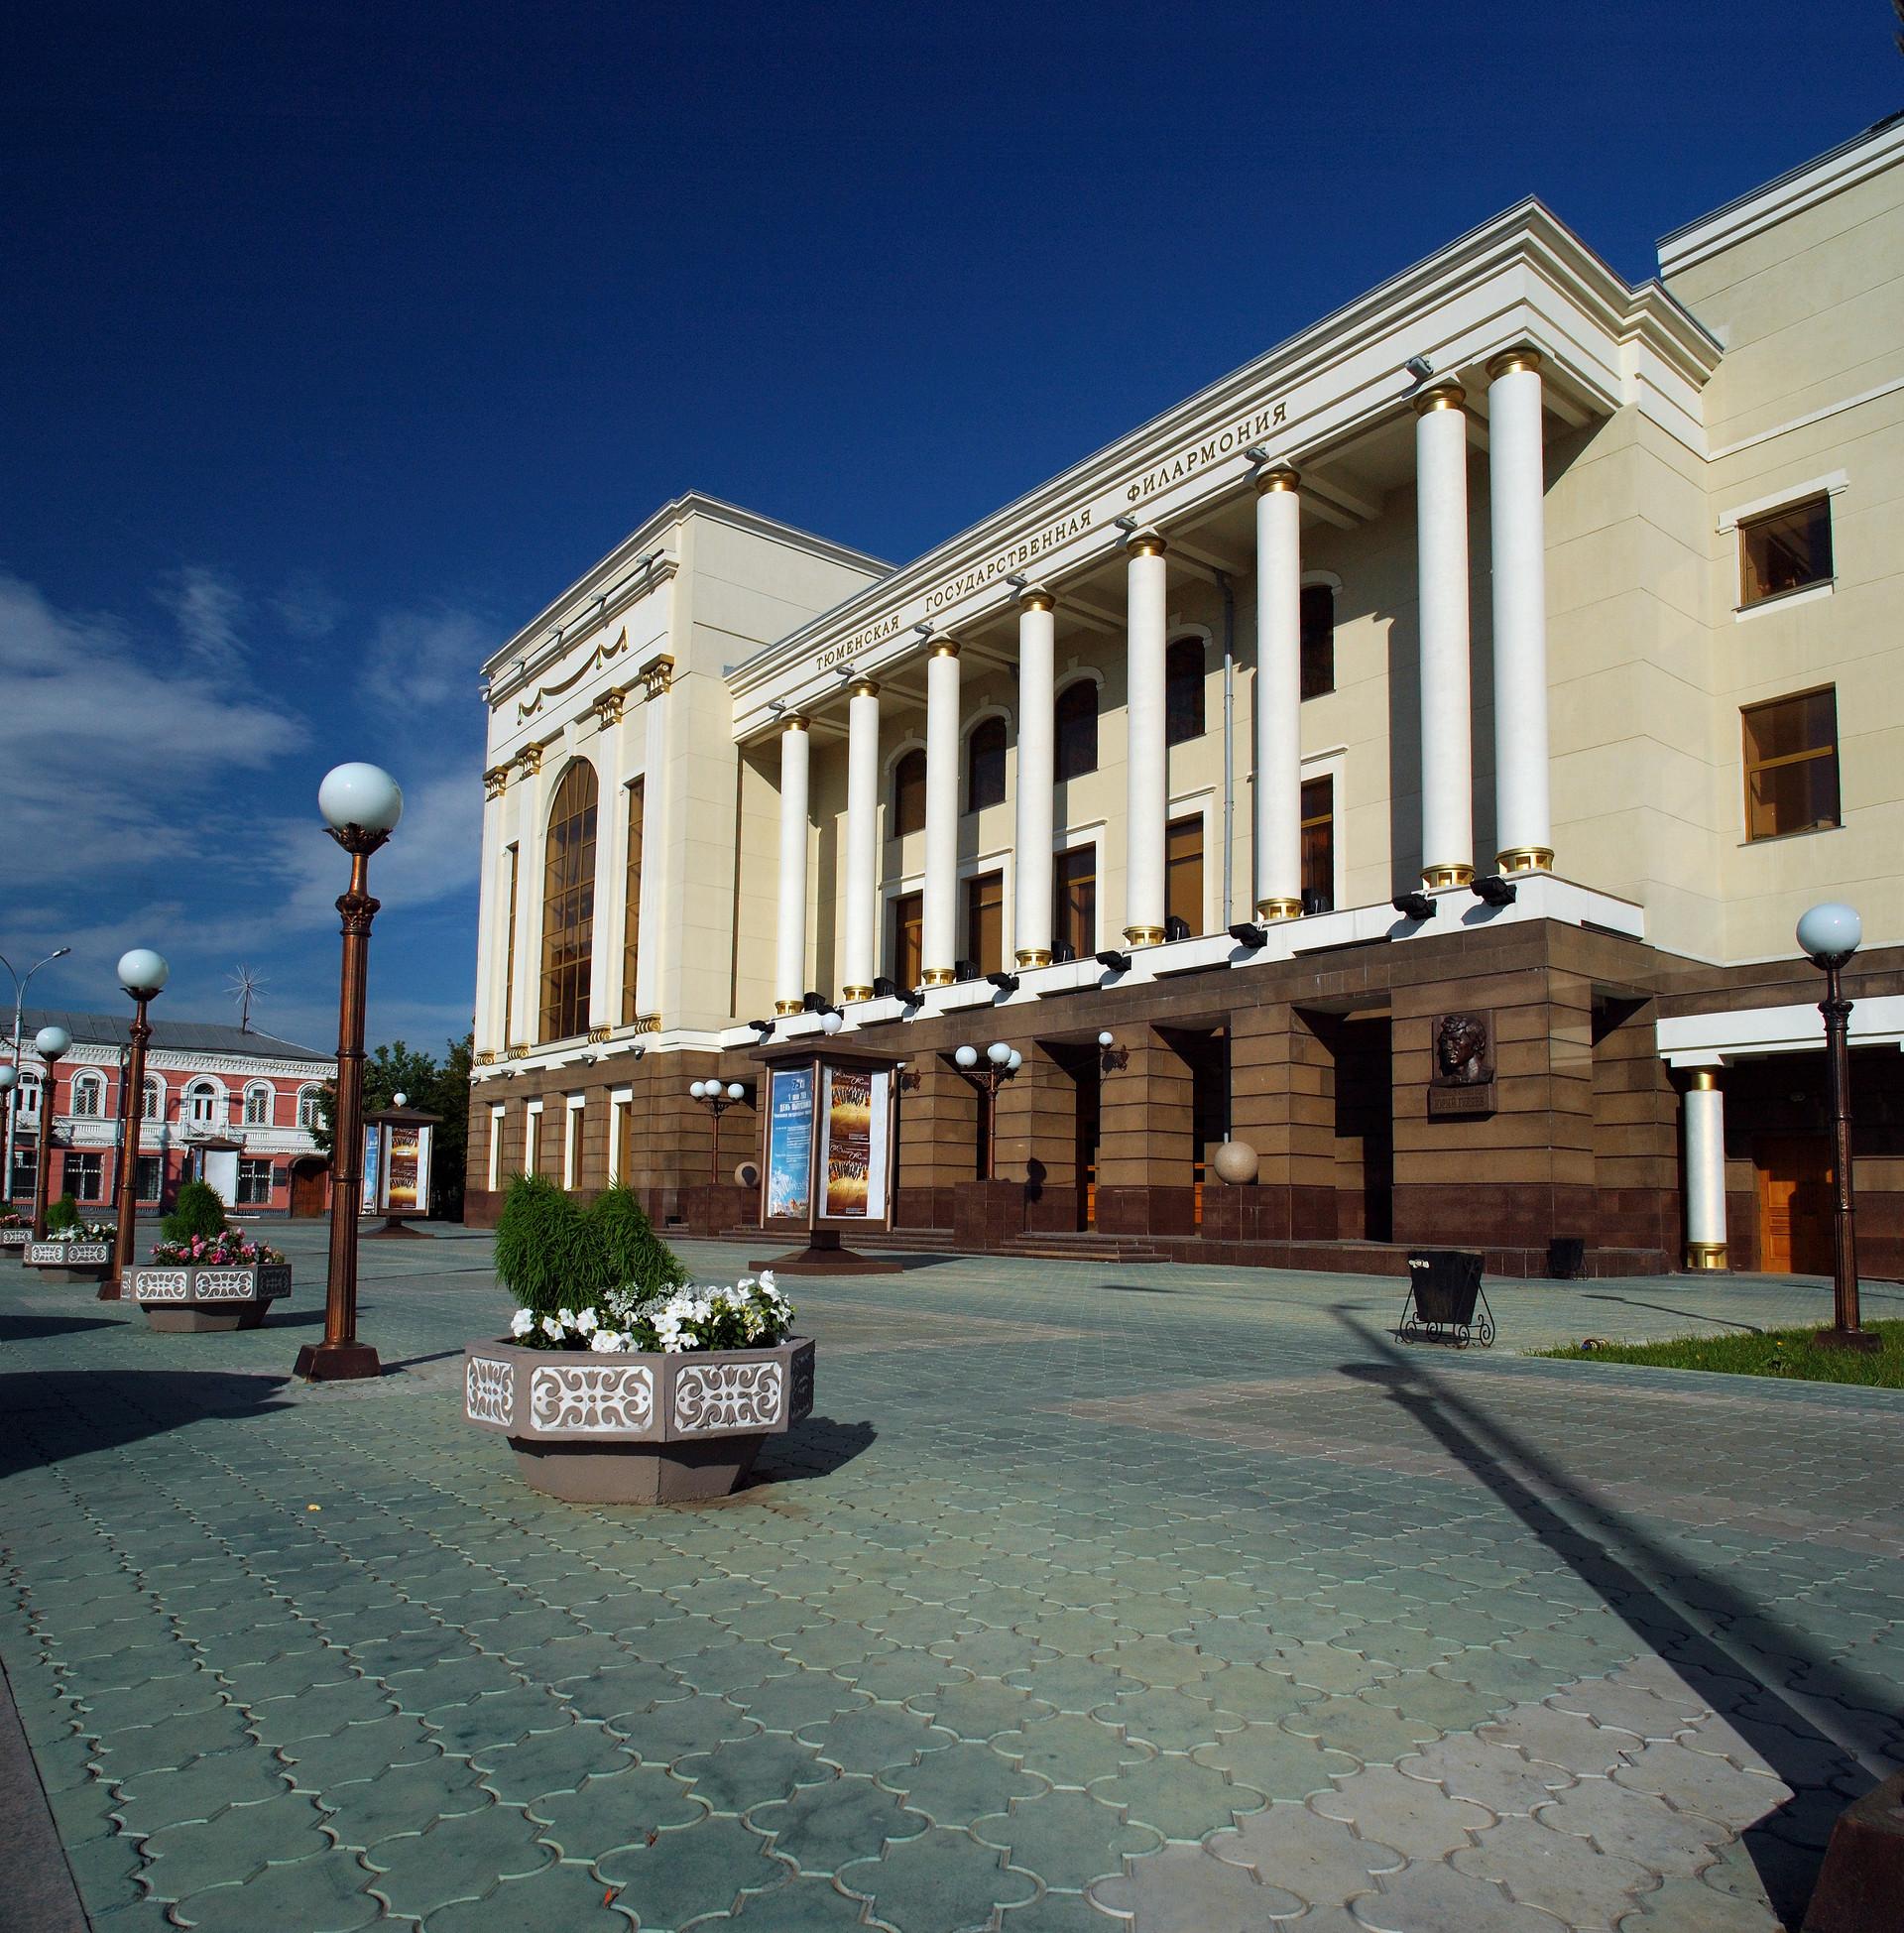 Tjumenska državna filharmonija